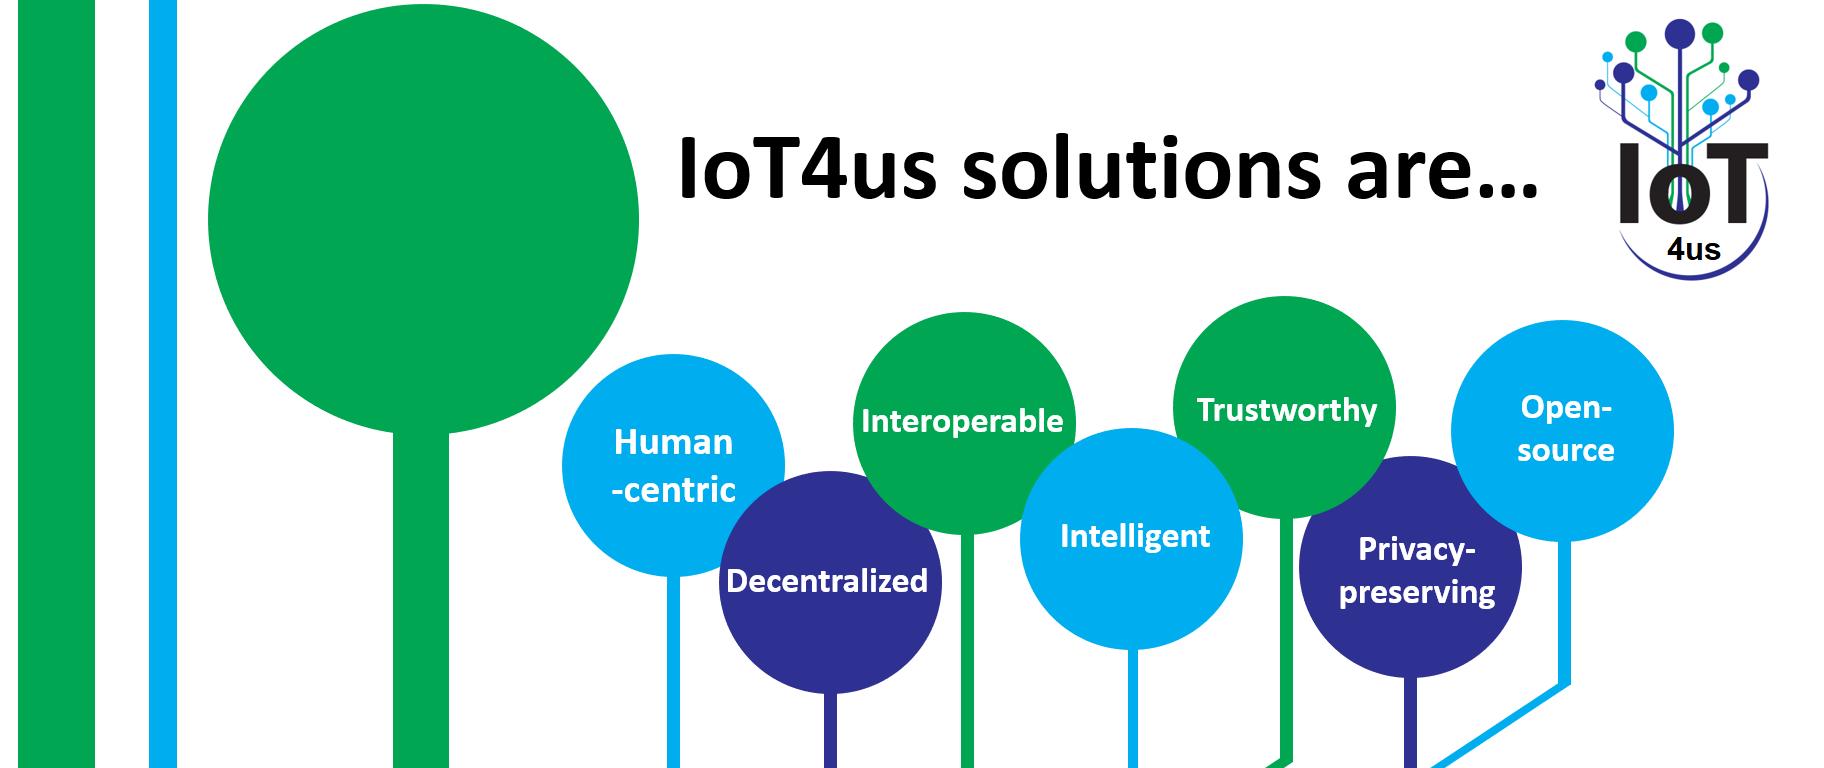 IoT4us